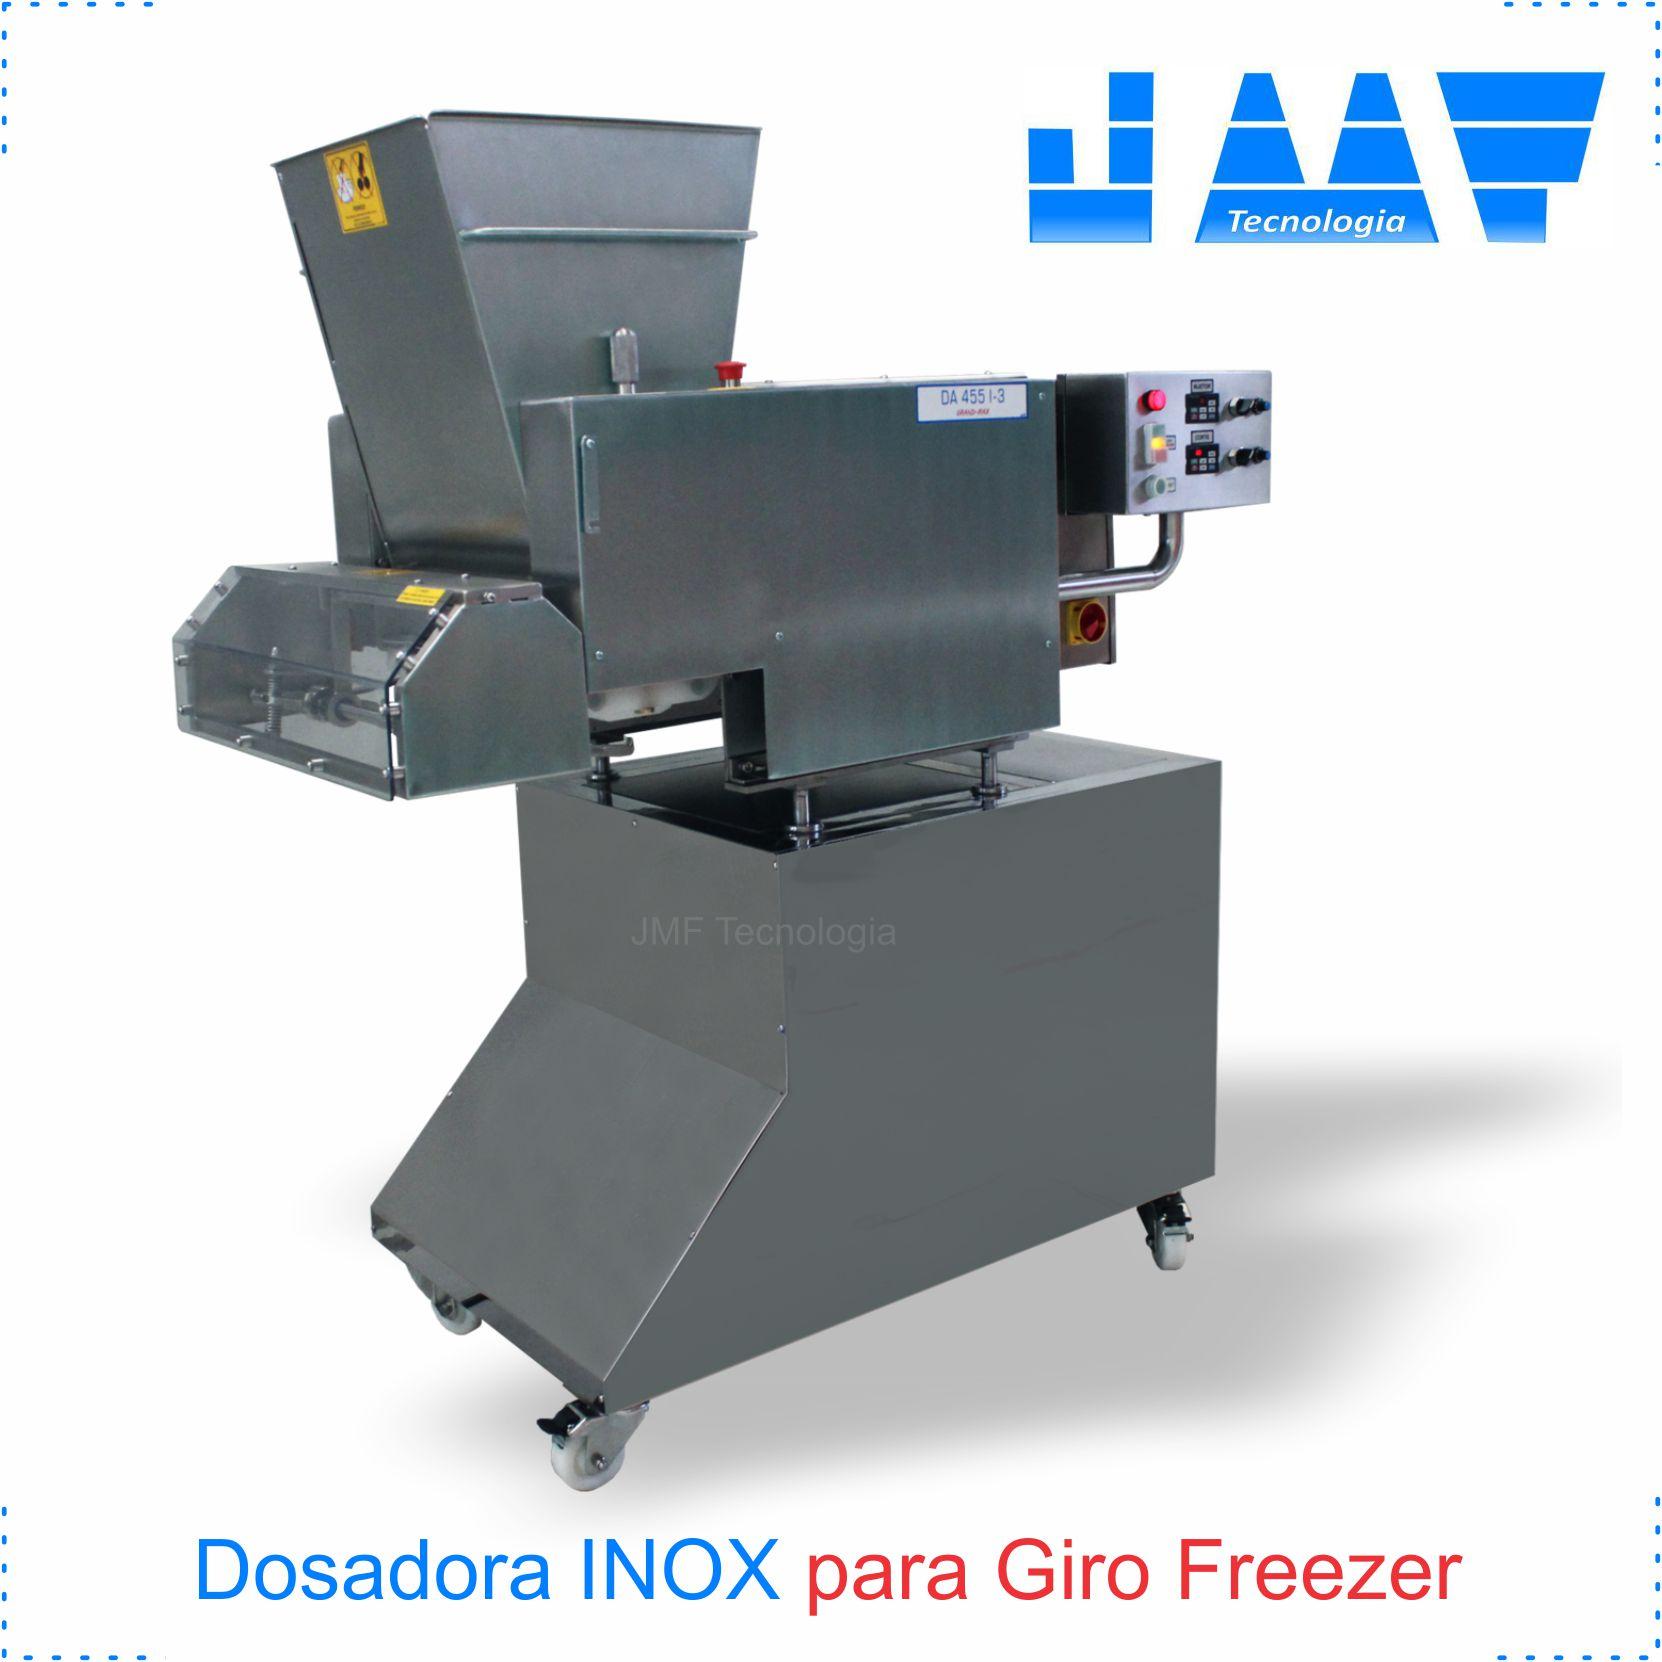 Dosadora para Giro Freezer